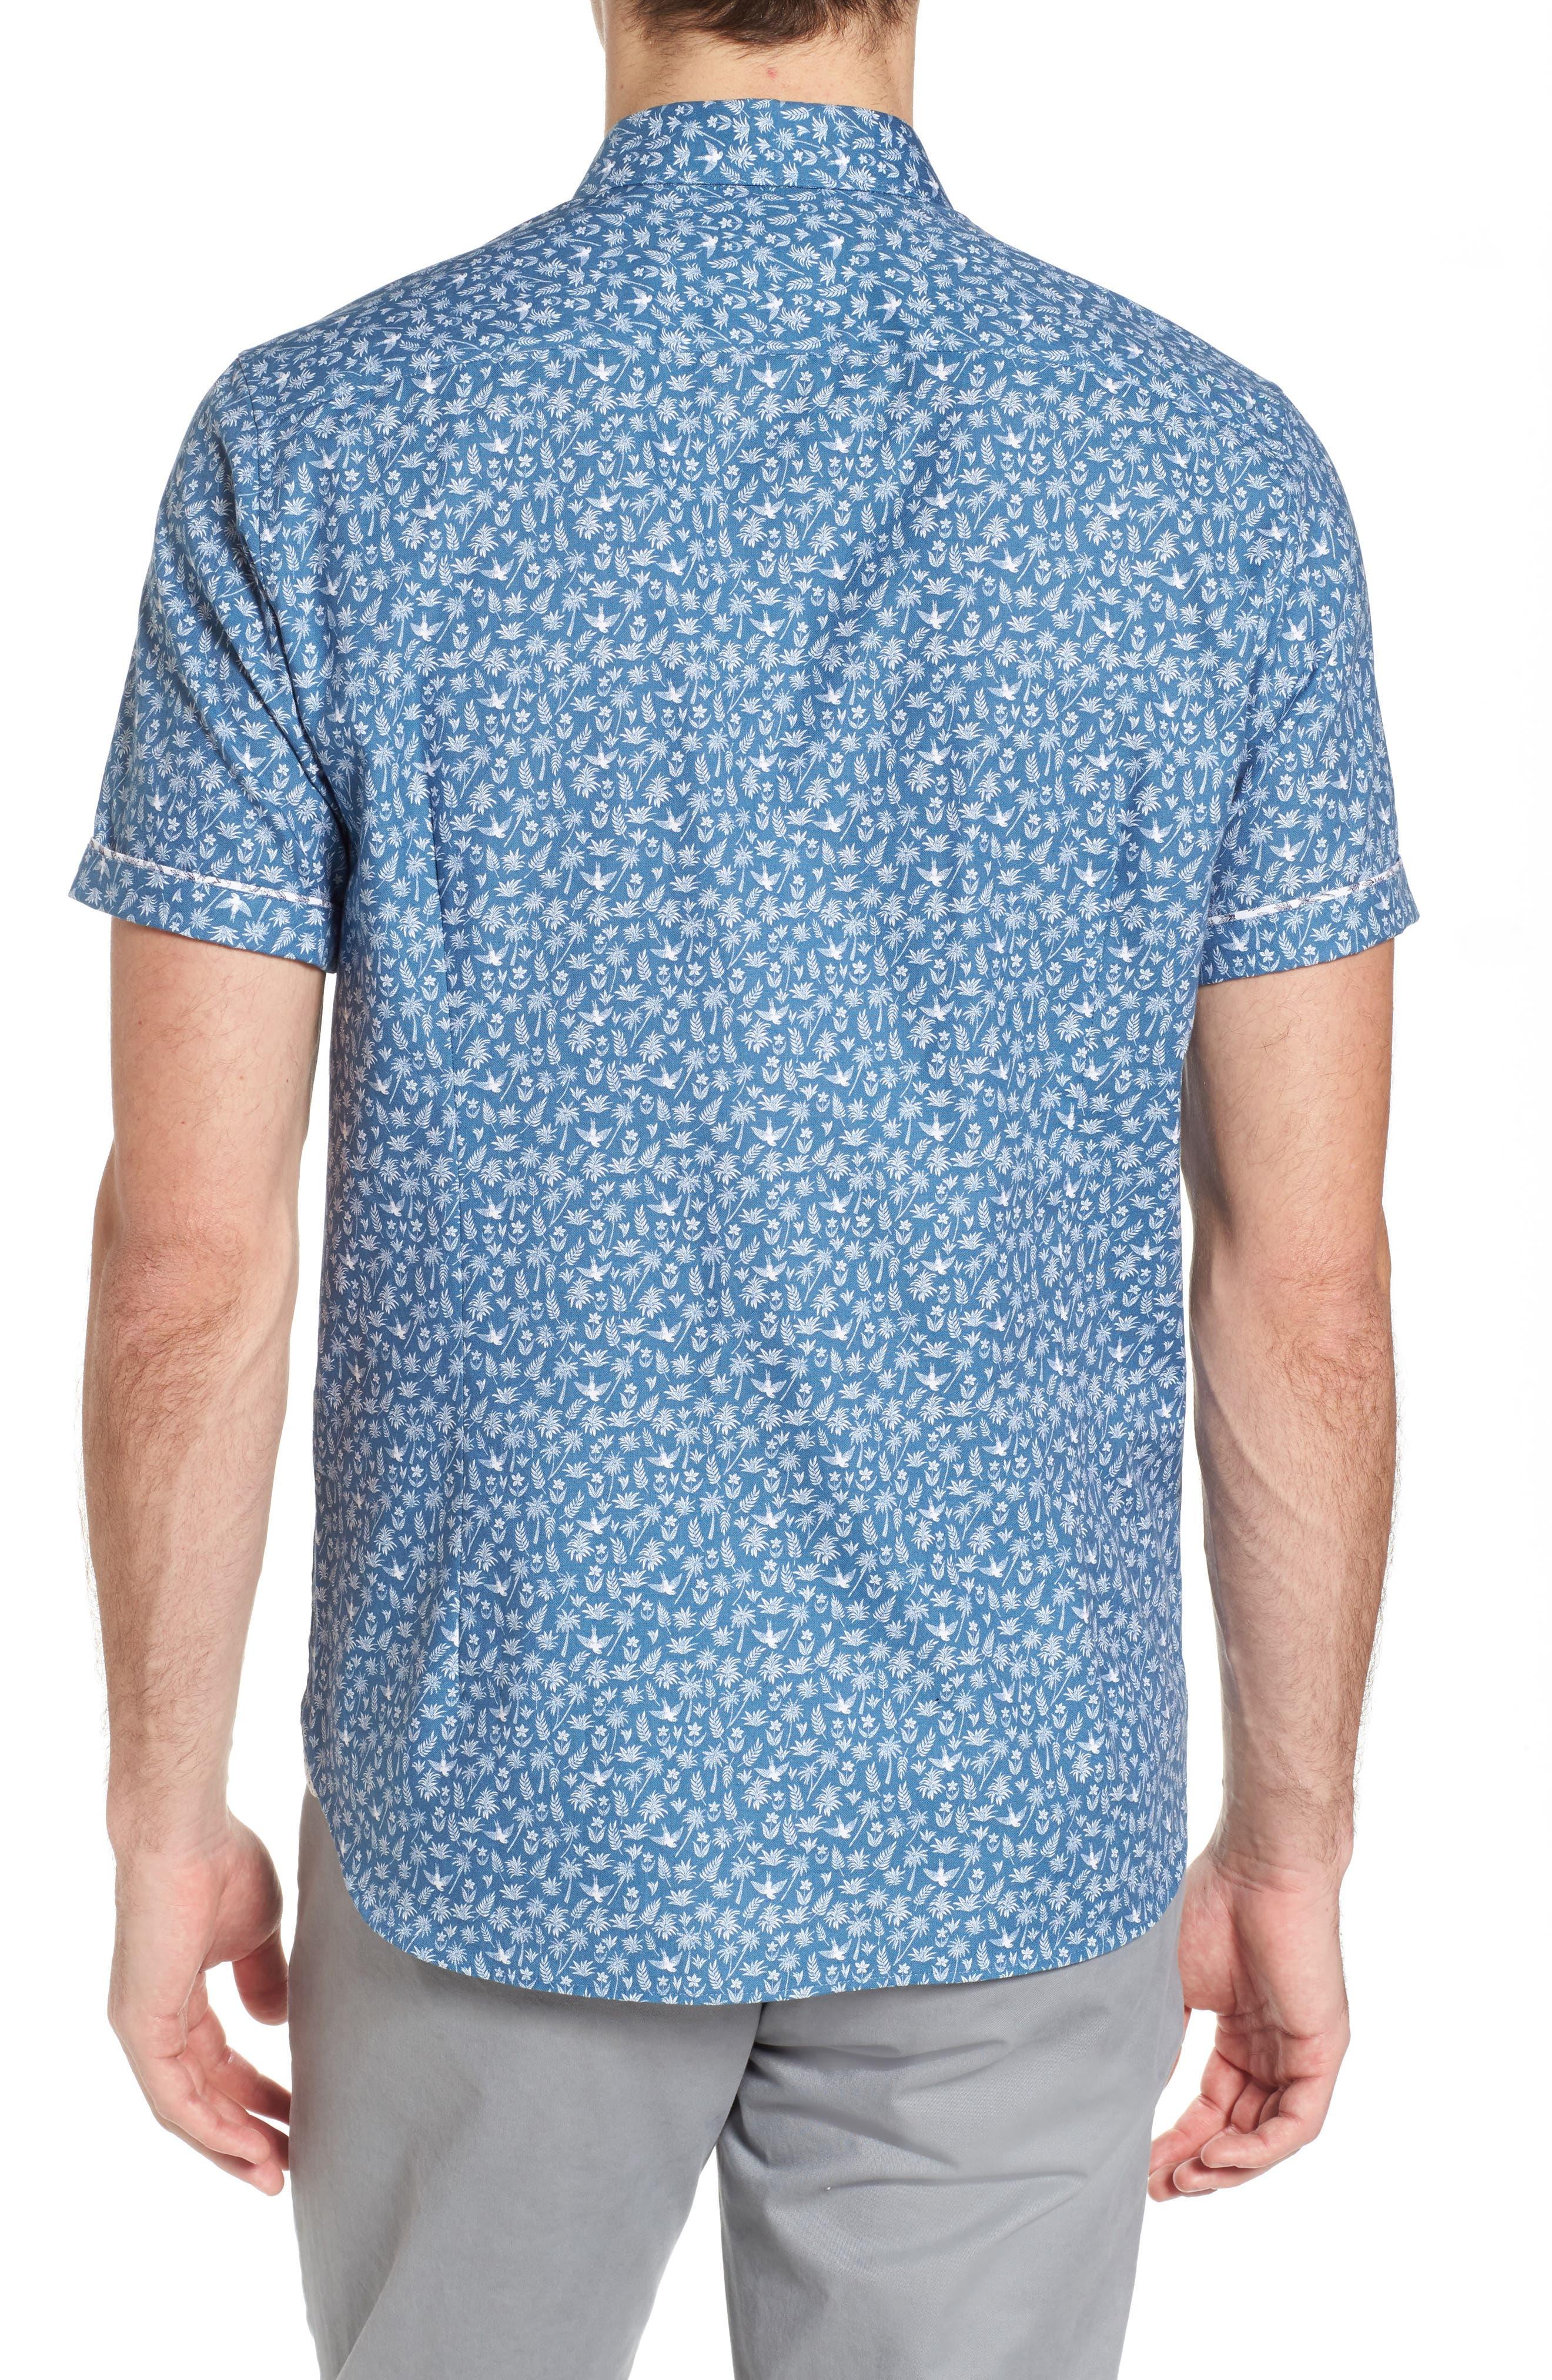 Pazta Tropic Print Shirt,                             Alternate thumbnail 2, color,                             400